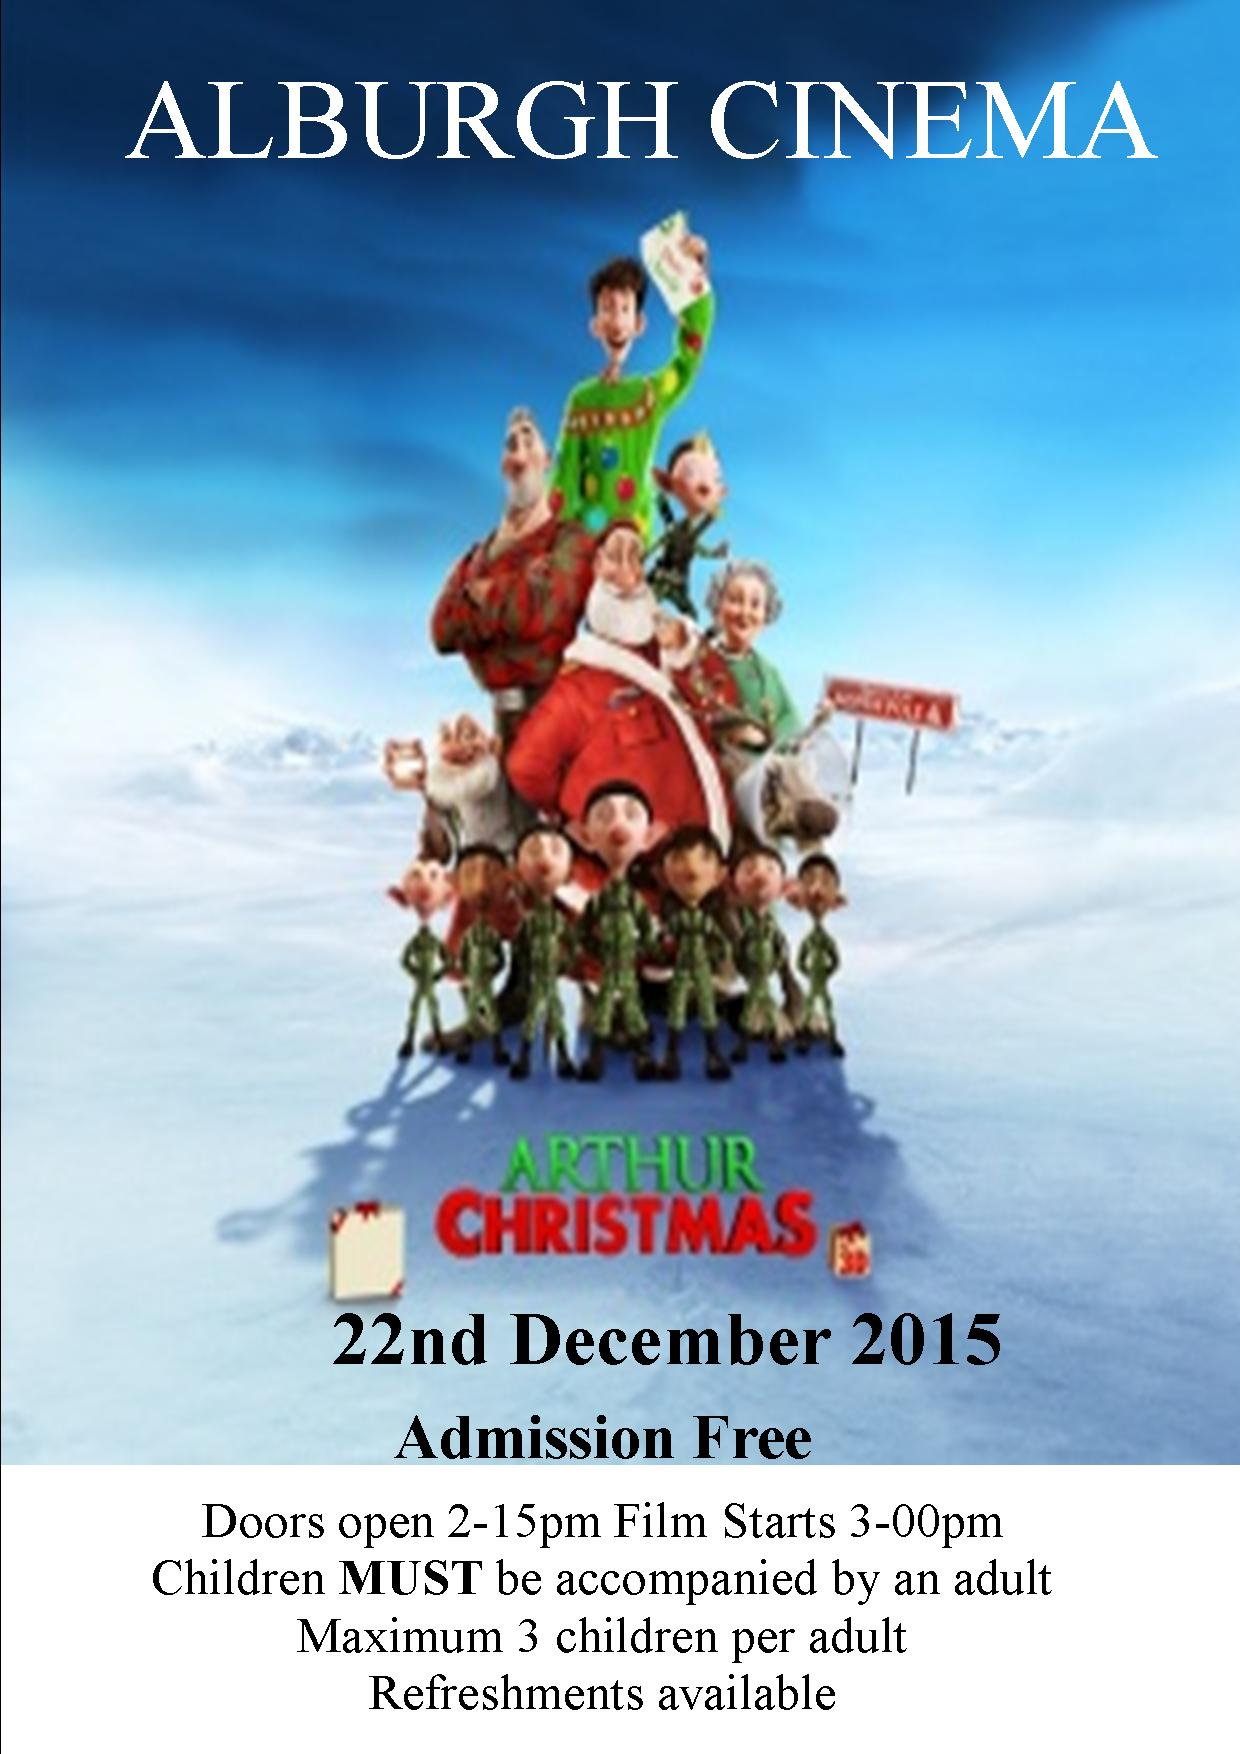 Alburgh Cinema – Arthur Christmas Alburgh